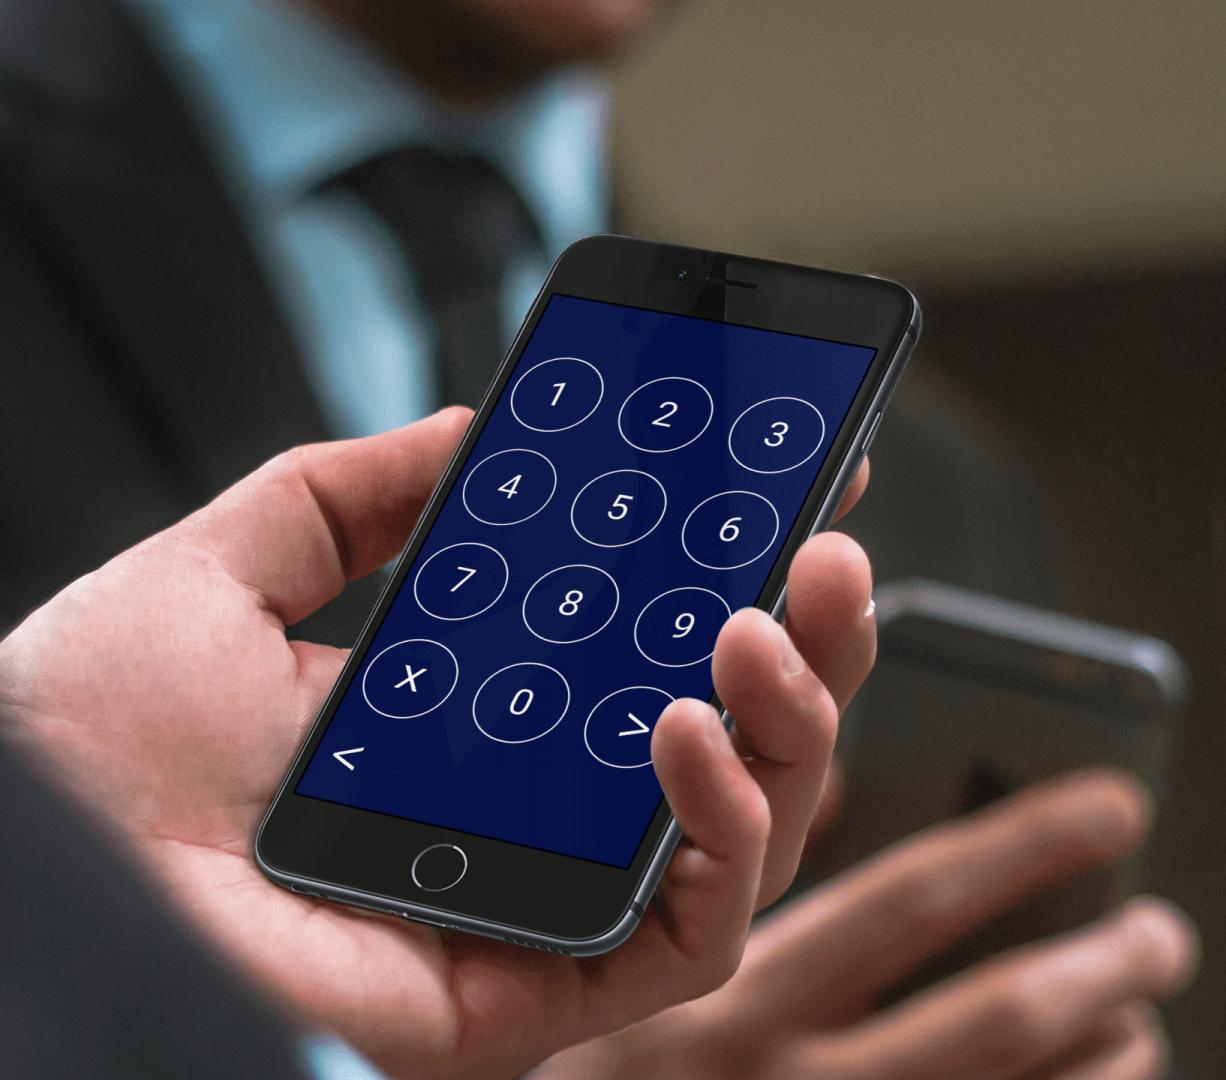 Einfache Bedienbarkeit mit Keypad, I-Beacon oder Swipe & Play